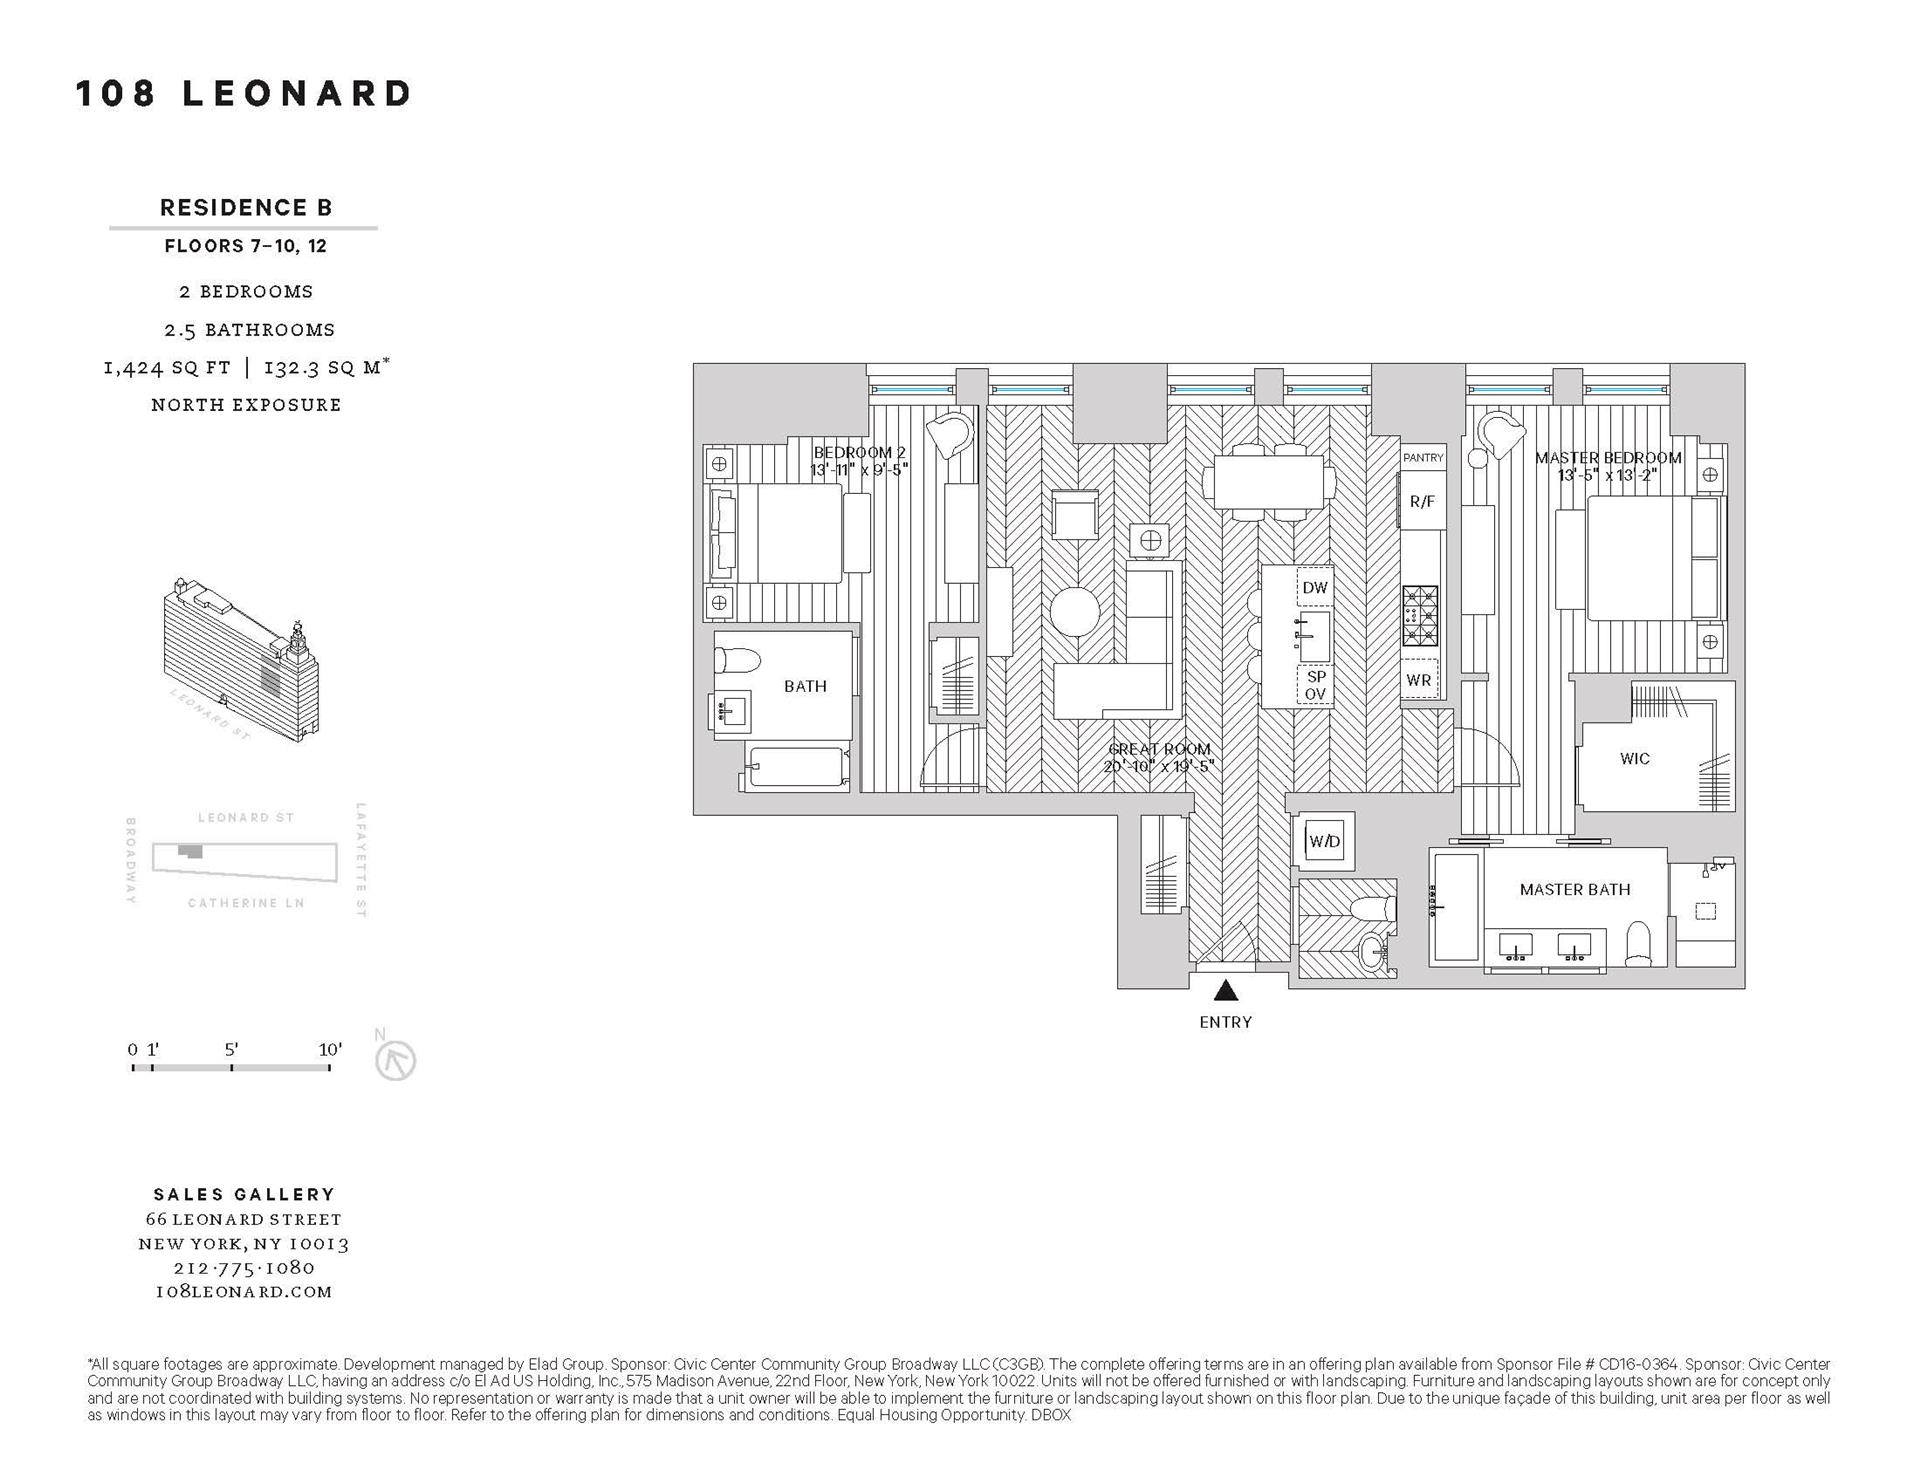 Floor plan of 108 Leonard St, 7B - TriBeCa, New York